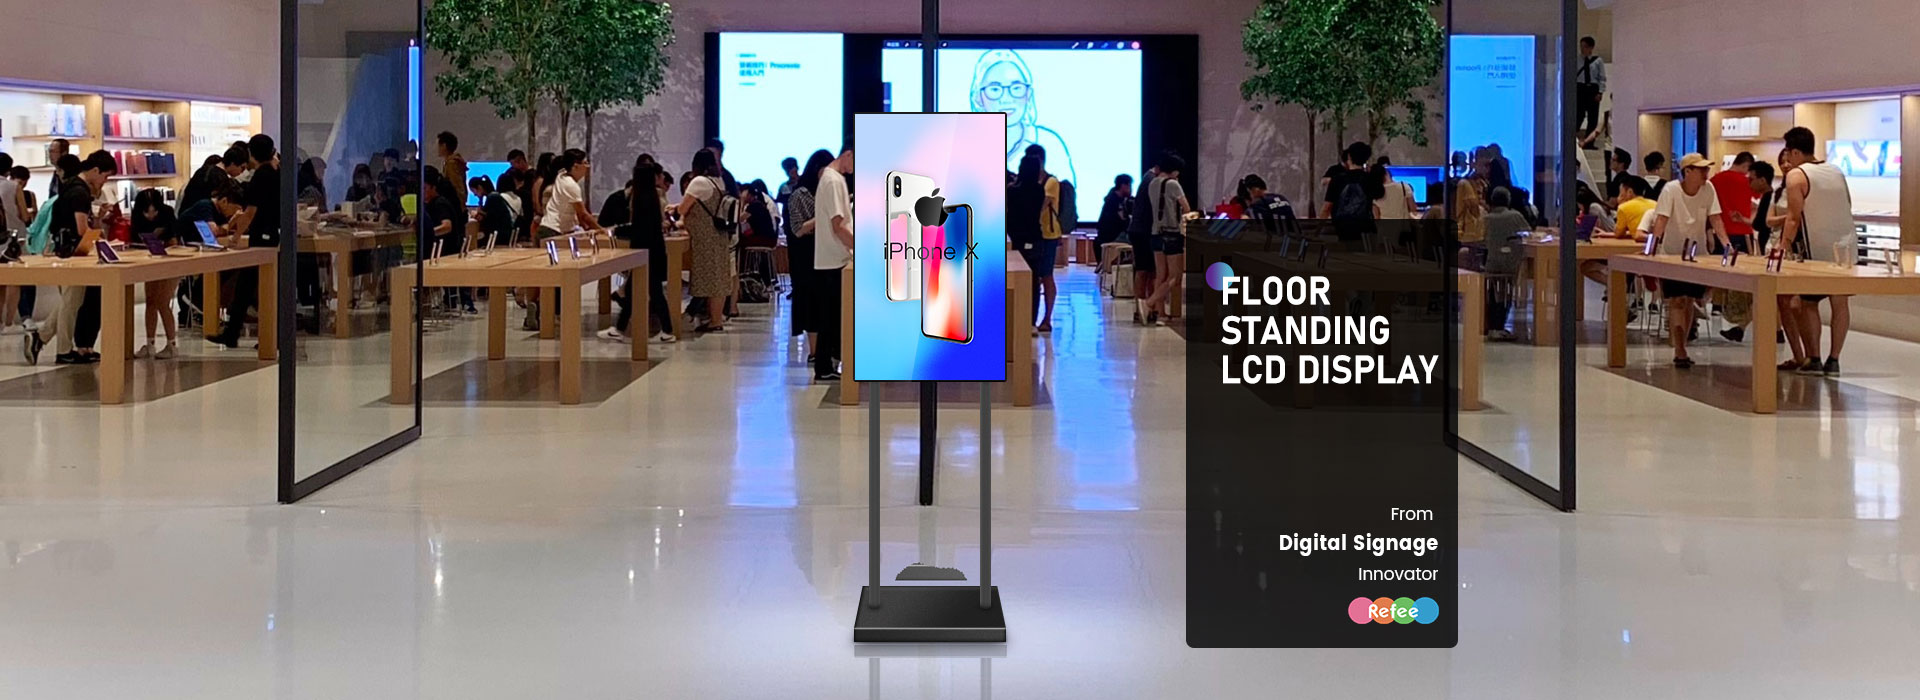 40-inch Floor Standing LCD Display